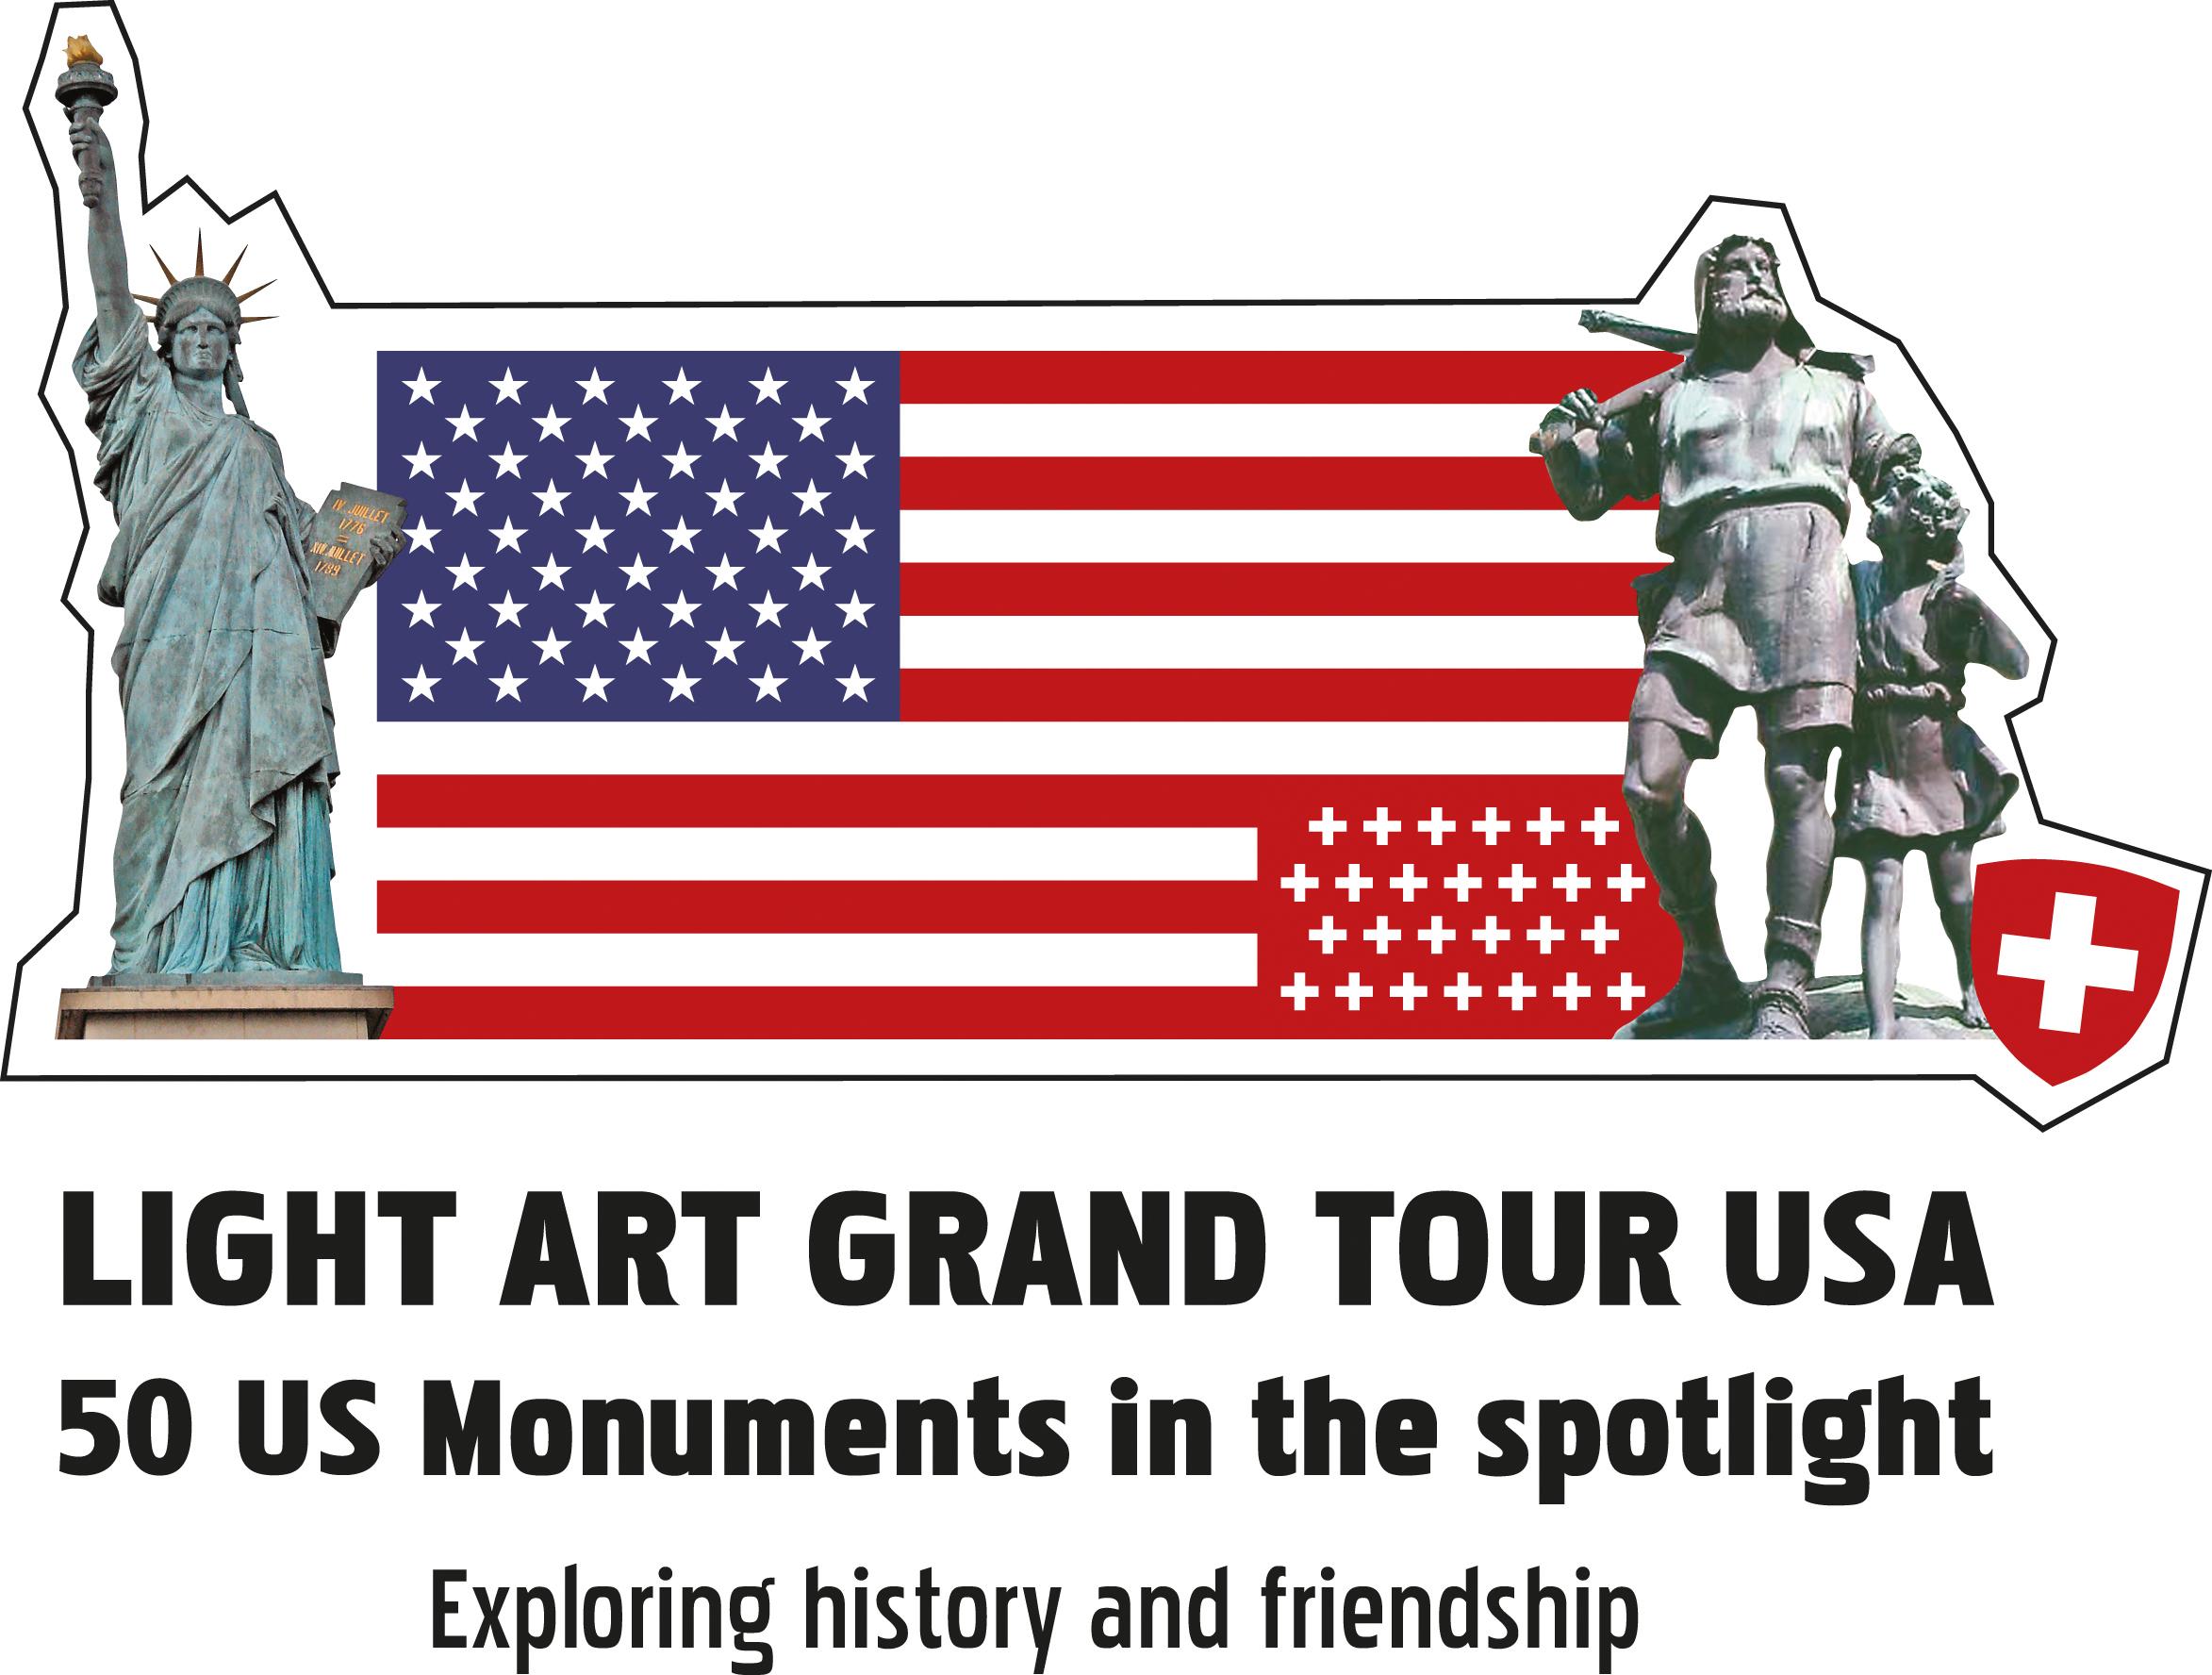 USA-SWISS-GRAND_TOUR_rgb_3-Claims.jpg